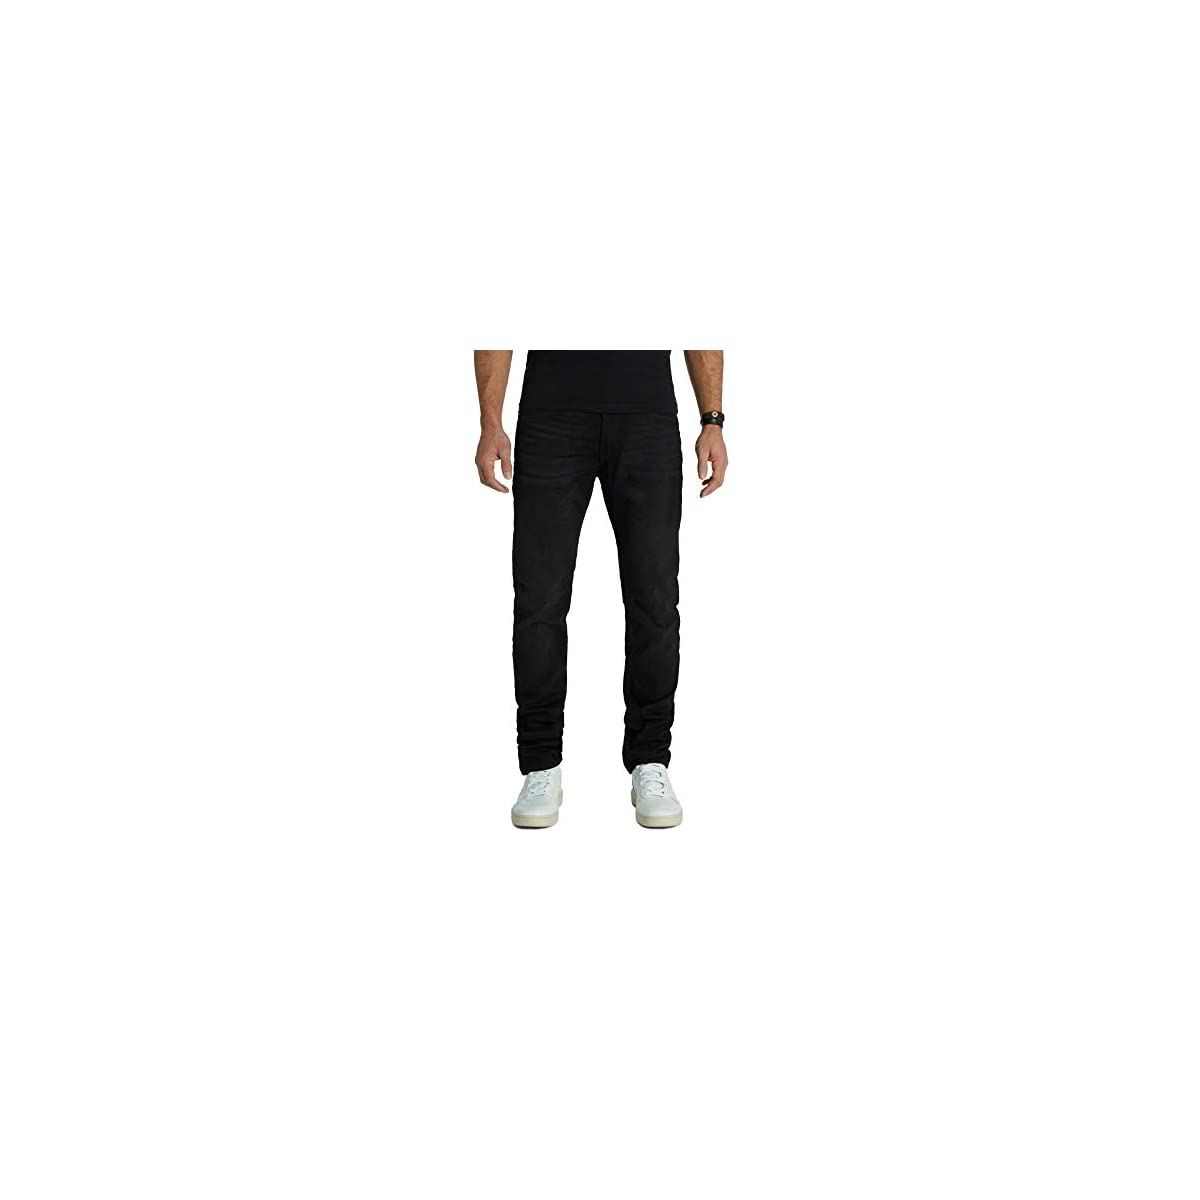 Kuyichi Herren Jeans Jamie Slim Back 2 Black Bio-Baumwolle